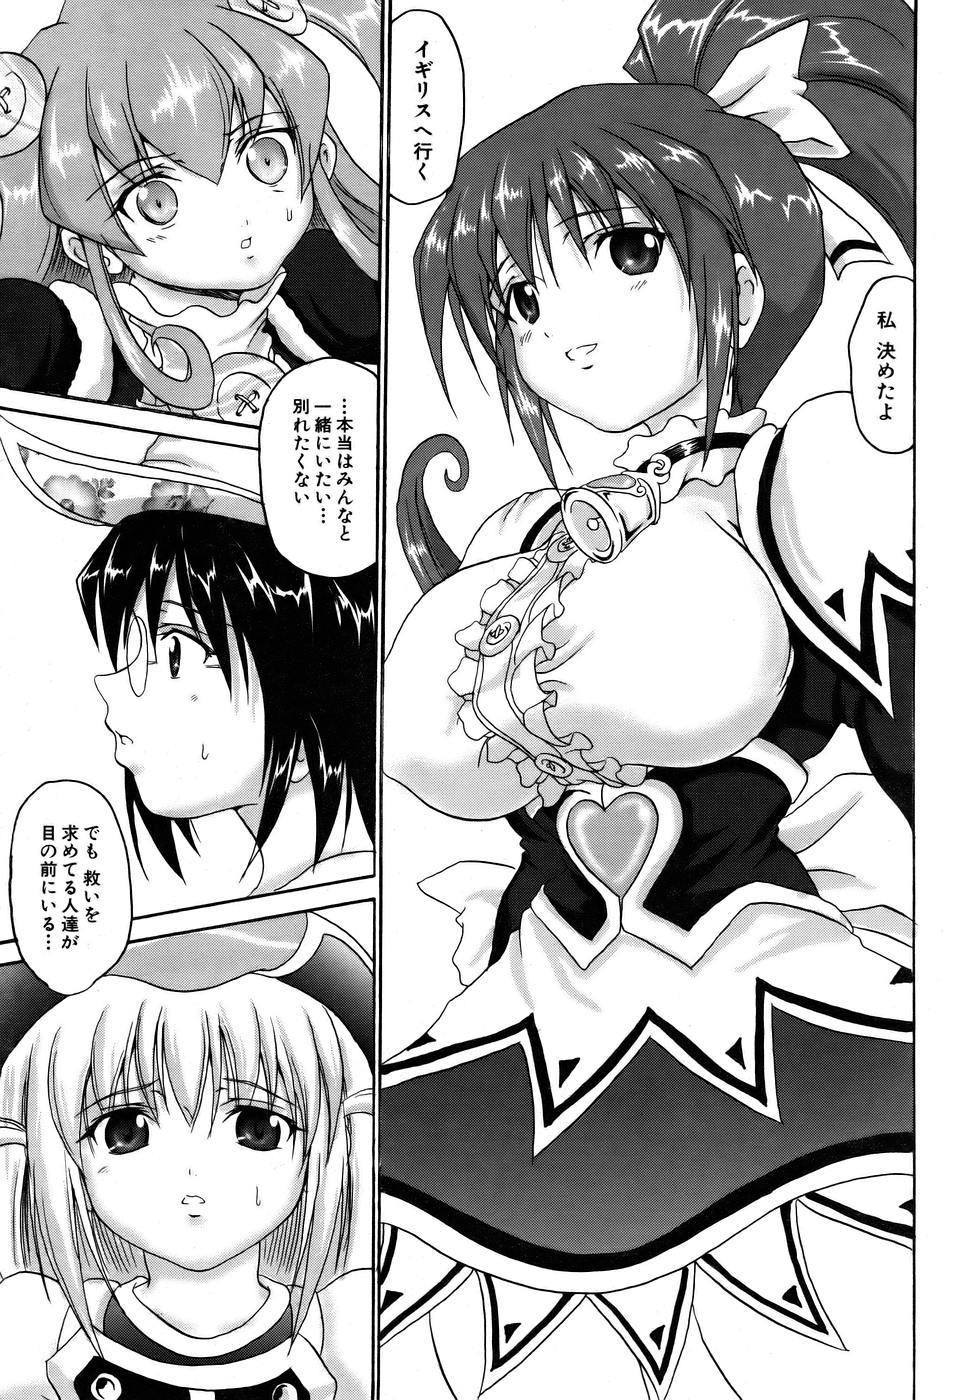 COMIC AUN 2005-12 Vol. 115 224